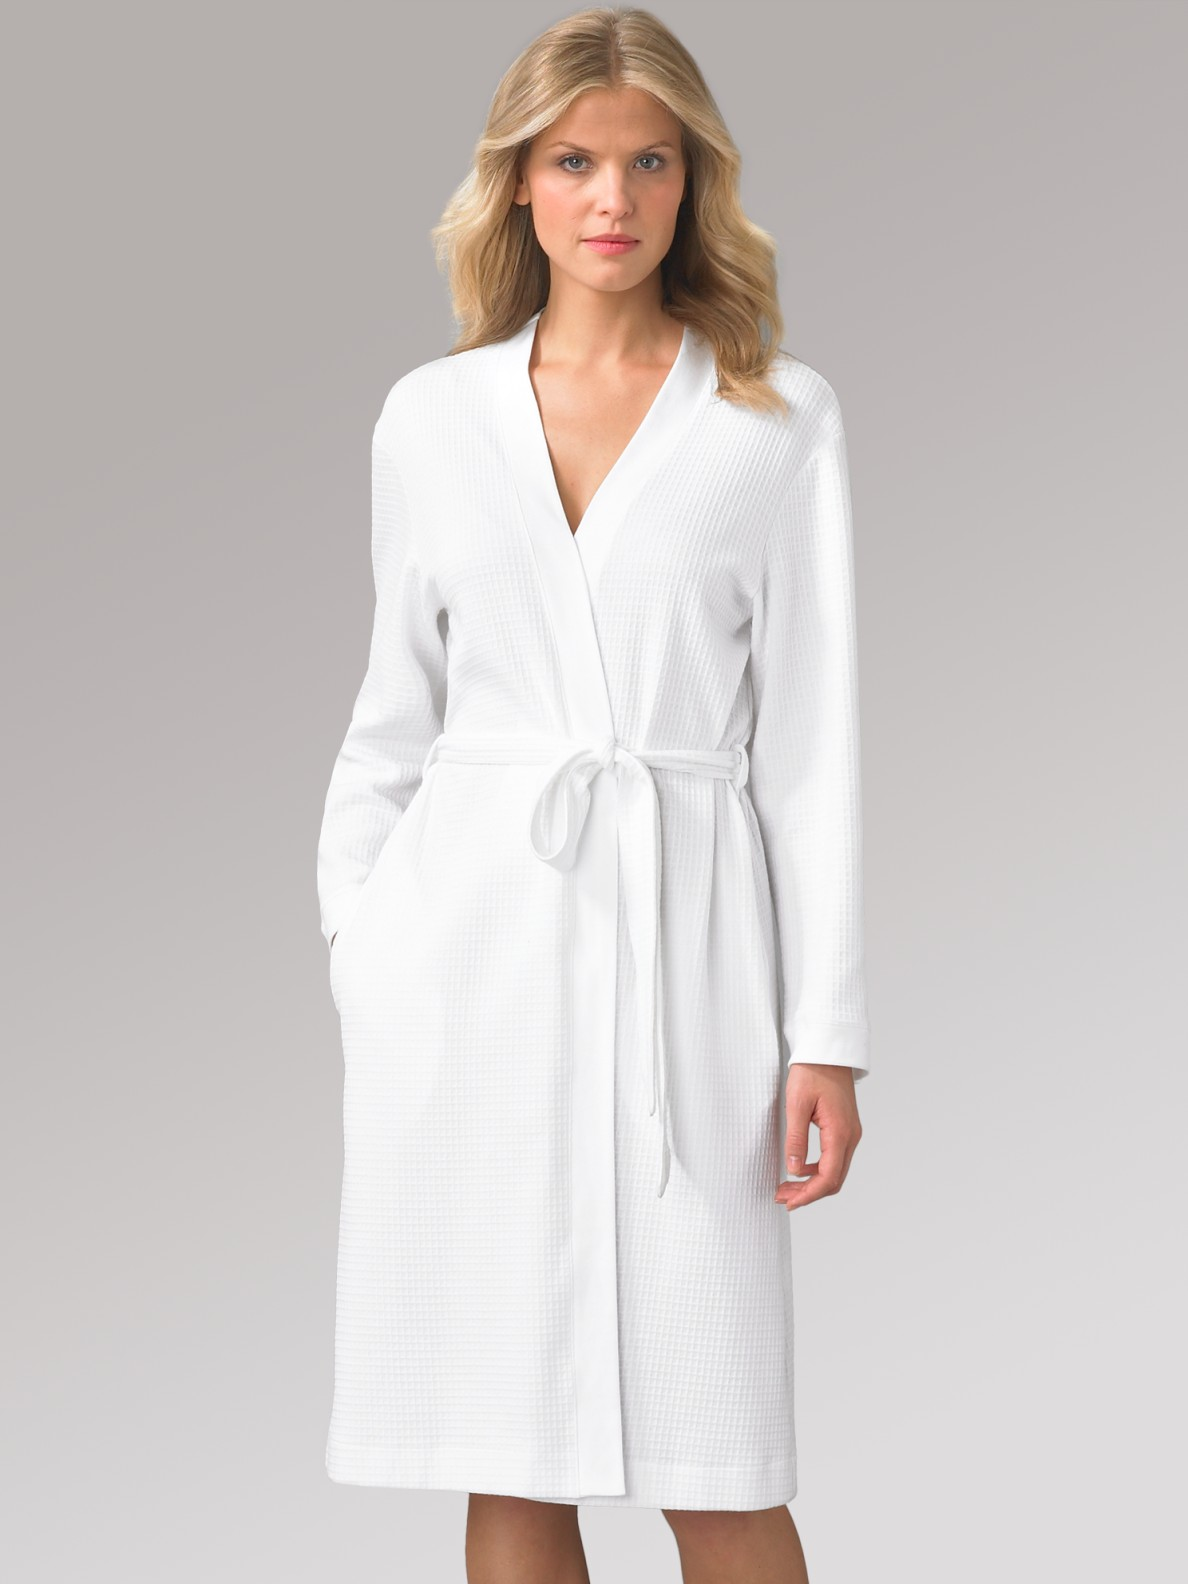 hanro short waffle knit robe in white lyst